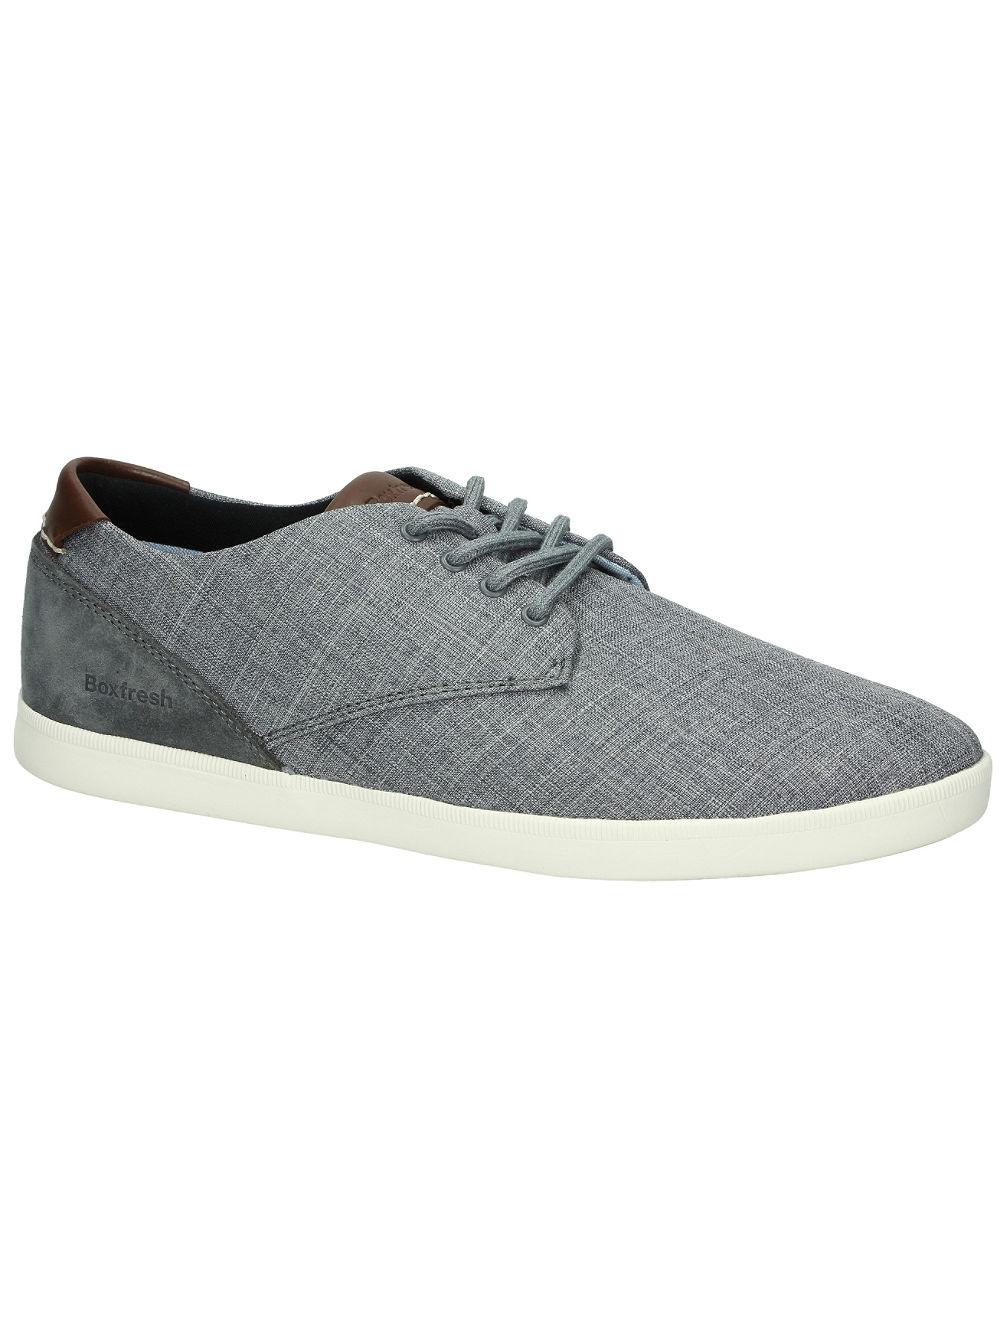 Boxfresh Henning Sneakers